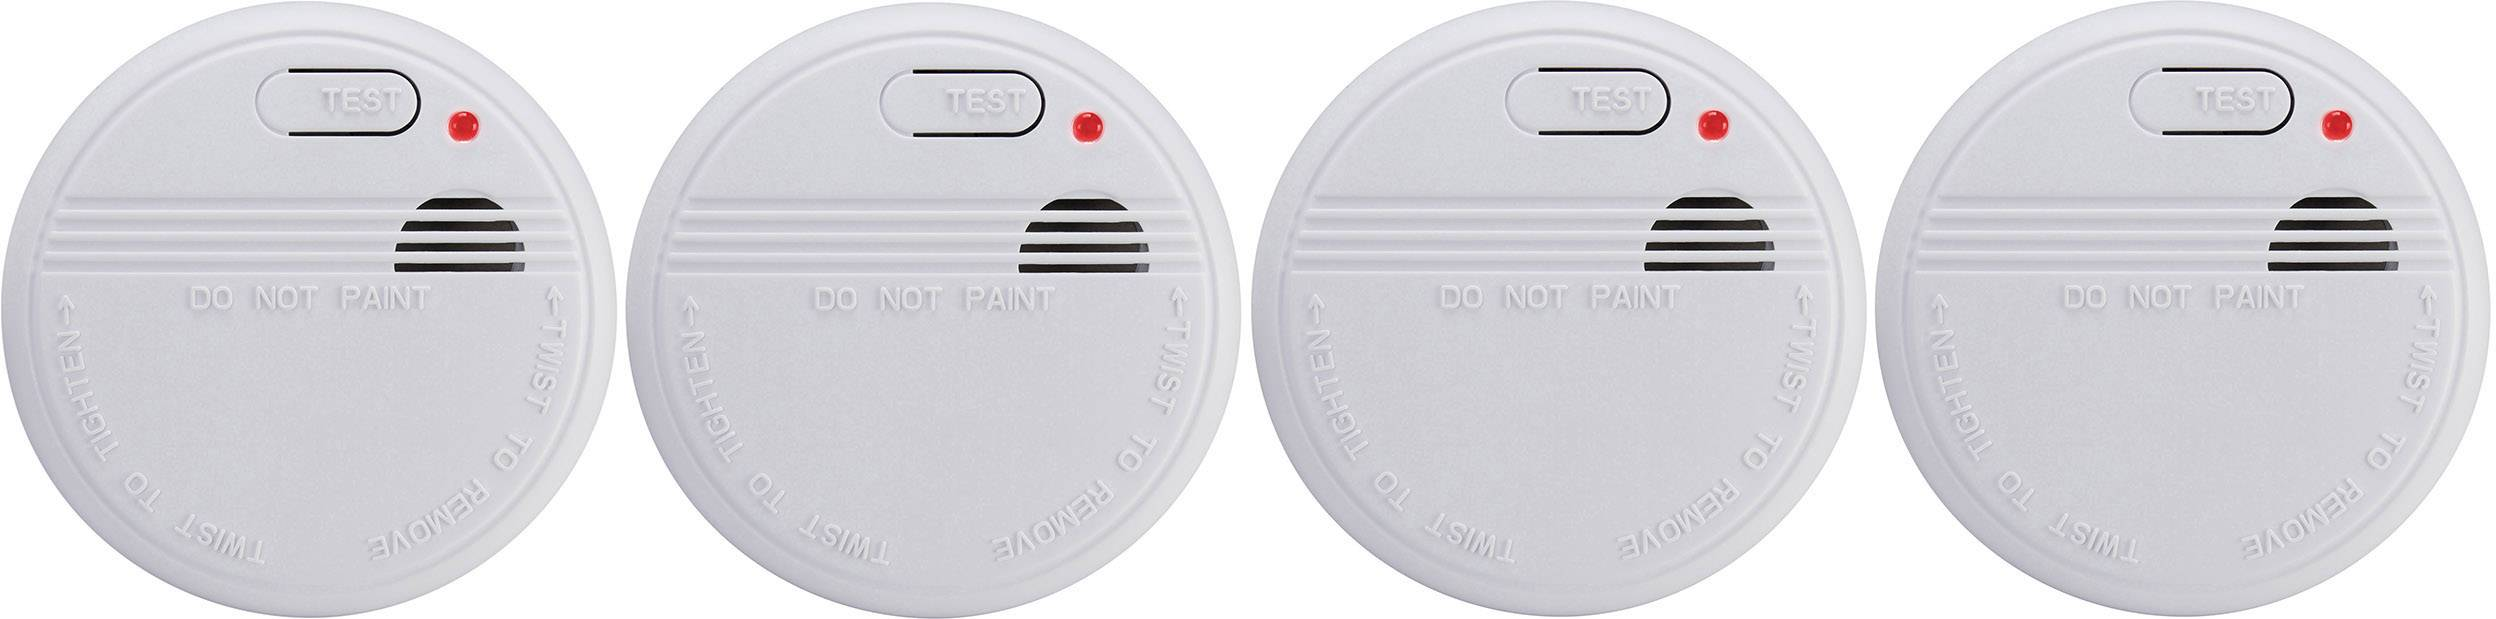 Detektor kouře Basetech na baterii, sada 4 ks